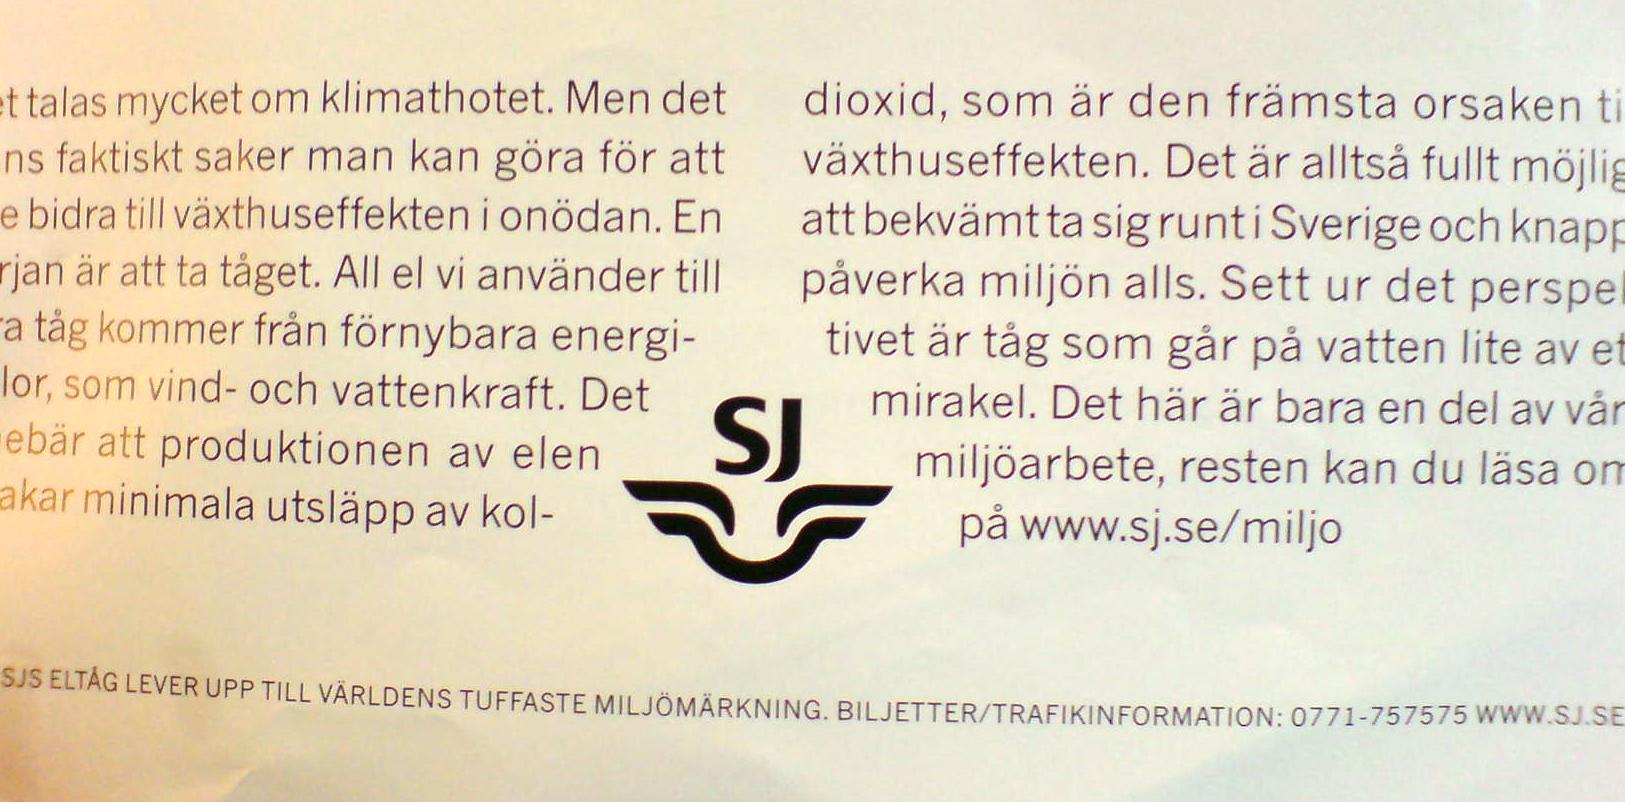 sj annons